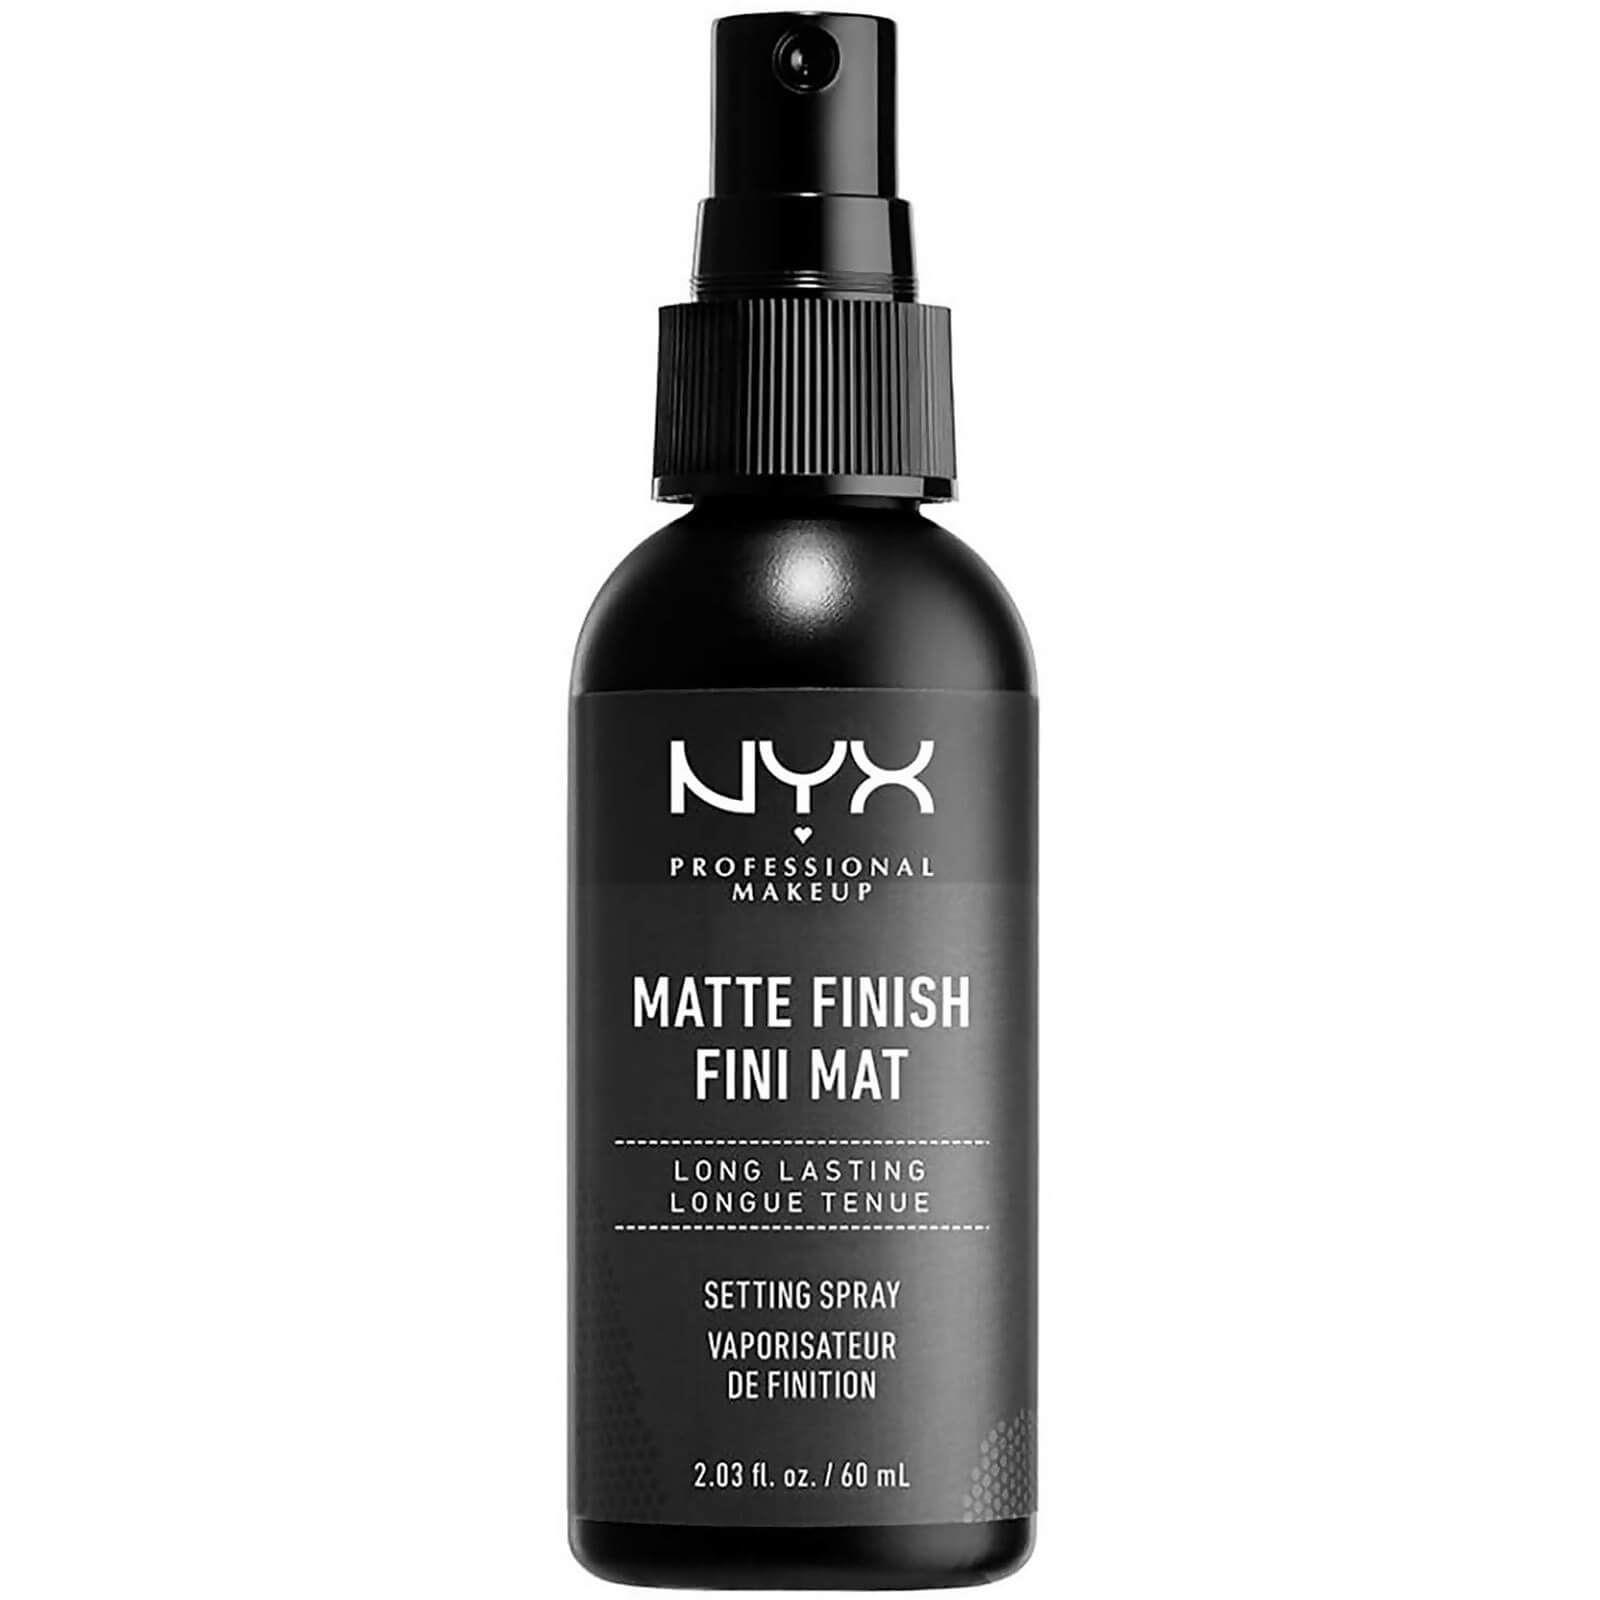 Купить Спрей-фиксатор NYX Professional Makeup Make Up Setting Spray - Matte Finish/Long Lasting